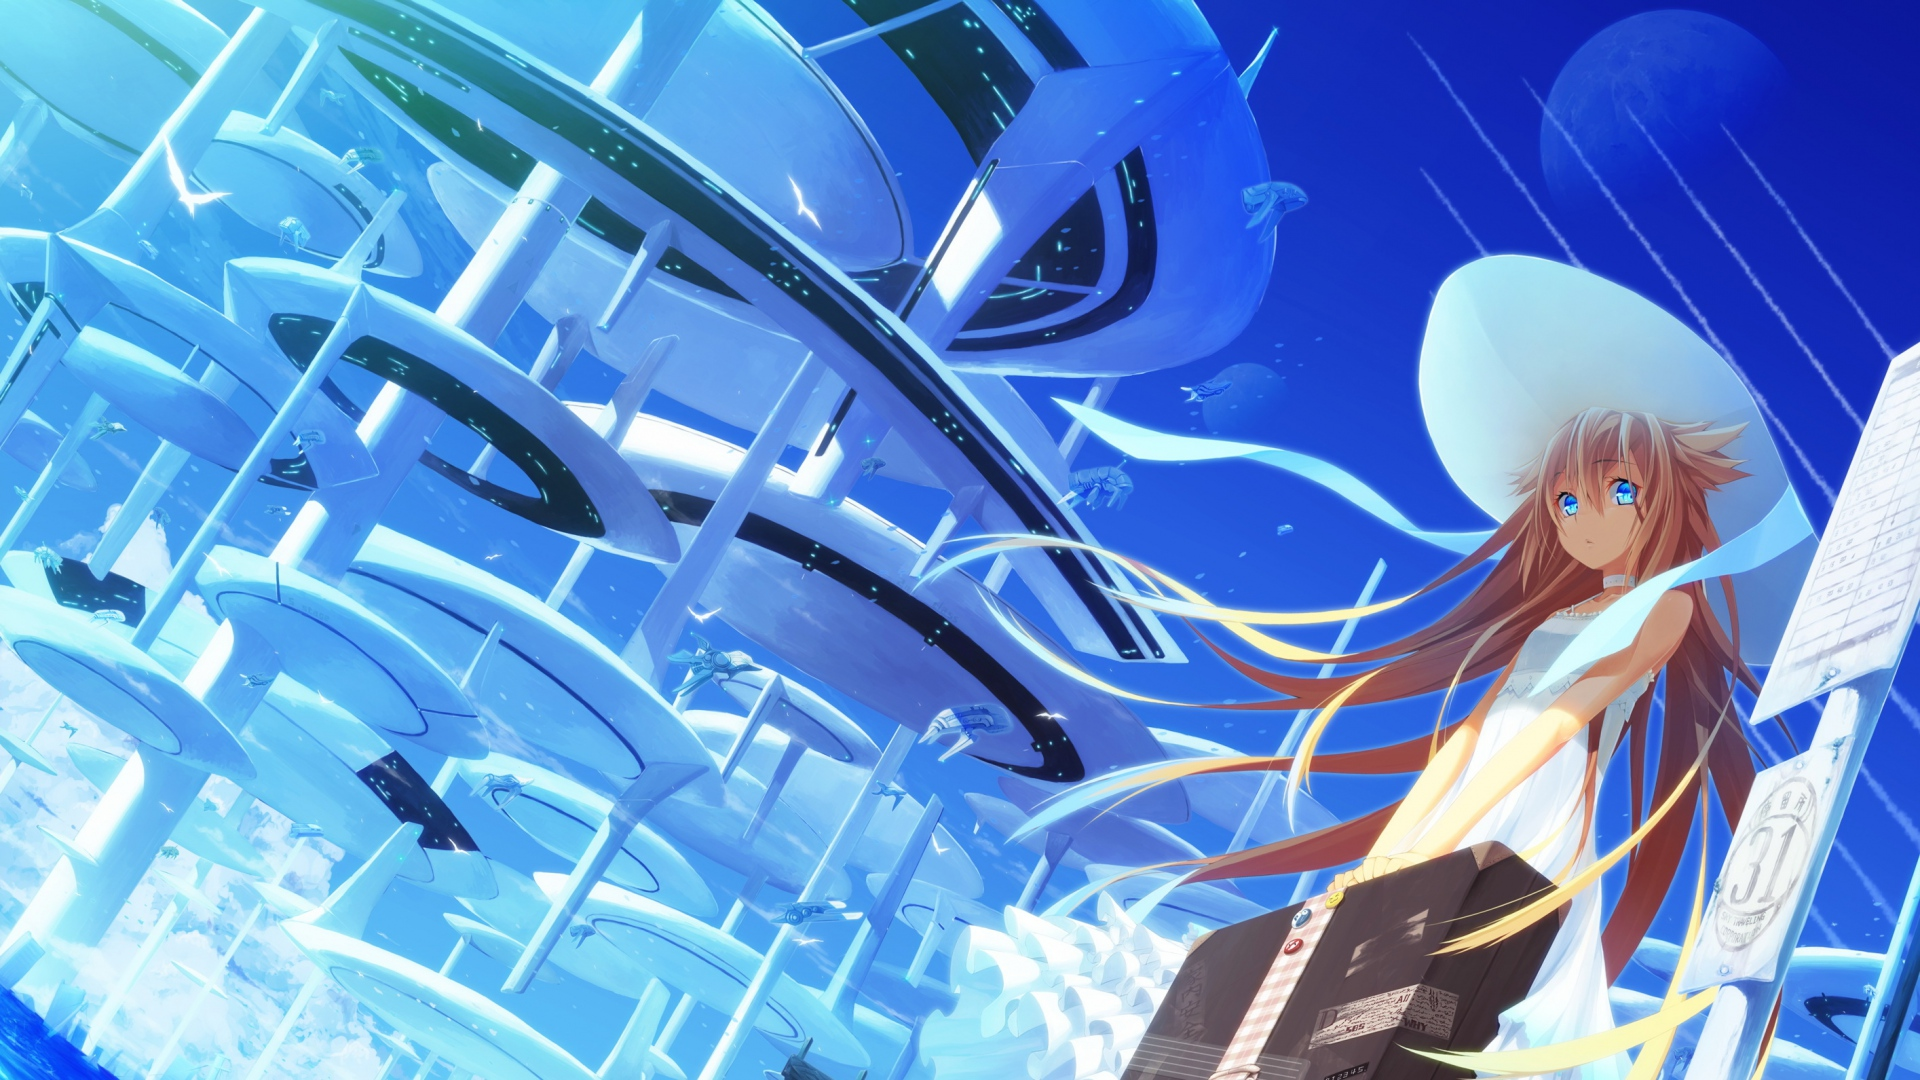 Old Anime Wallpaper's (Full-HD) - 15.05.14 file - Mod DB